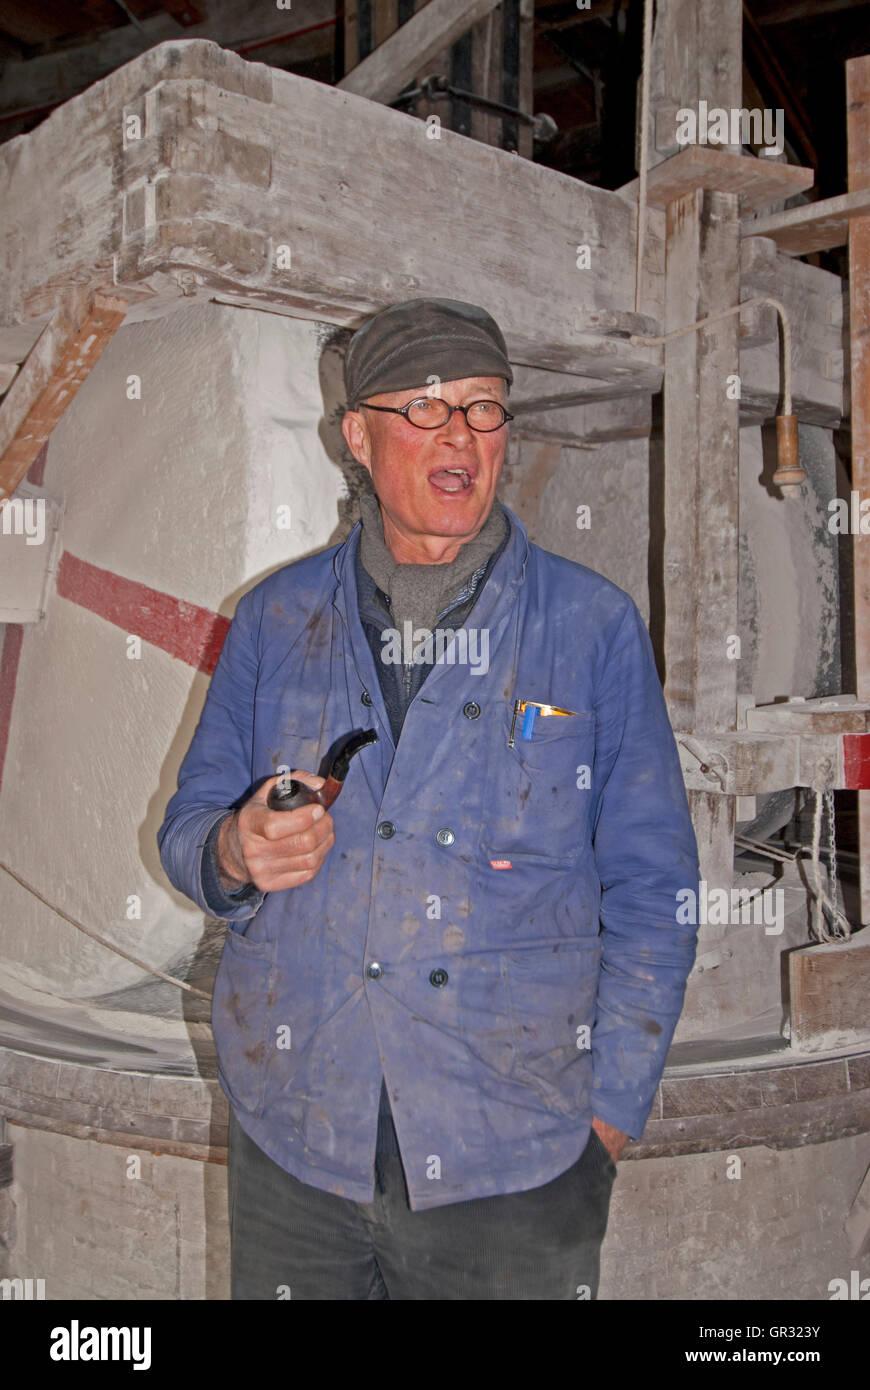 Guide and interpreter, Piel Kempenaar, provides information at De Kat Windmill - Stock Image